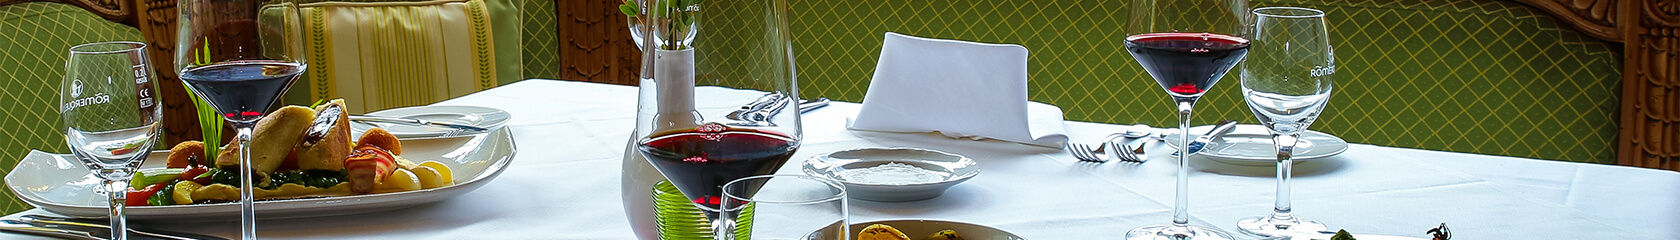 Kulinarik im Hotel Via Salina